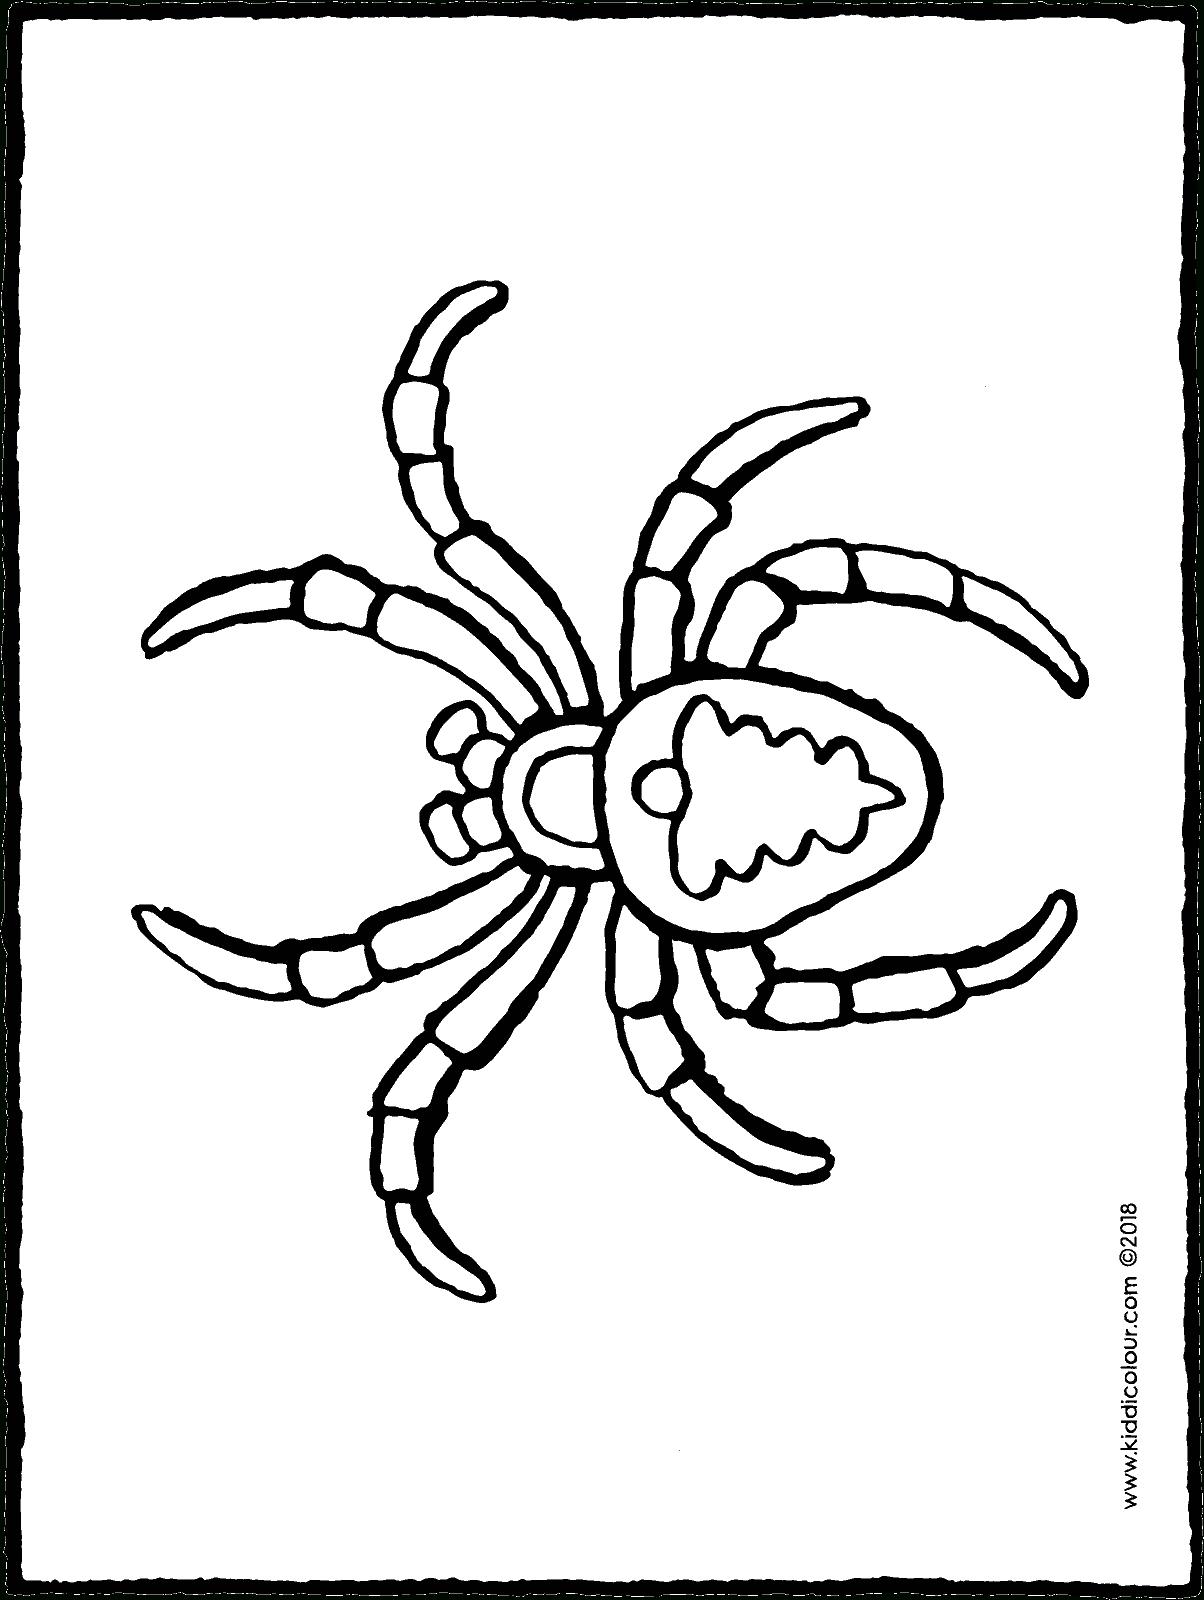 Araignée - Kiddicoloriage tout Dessiner Une Araignee